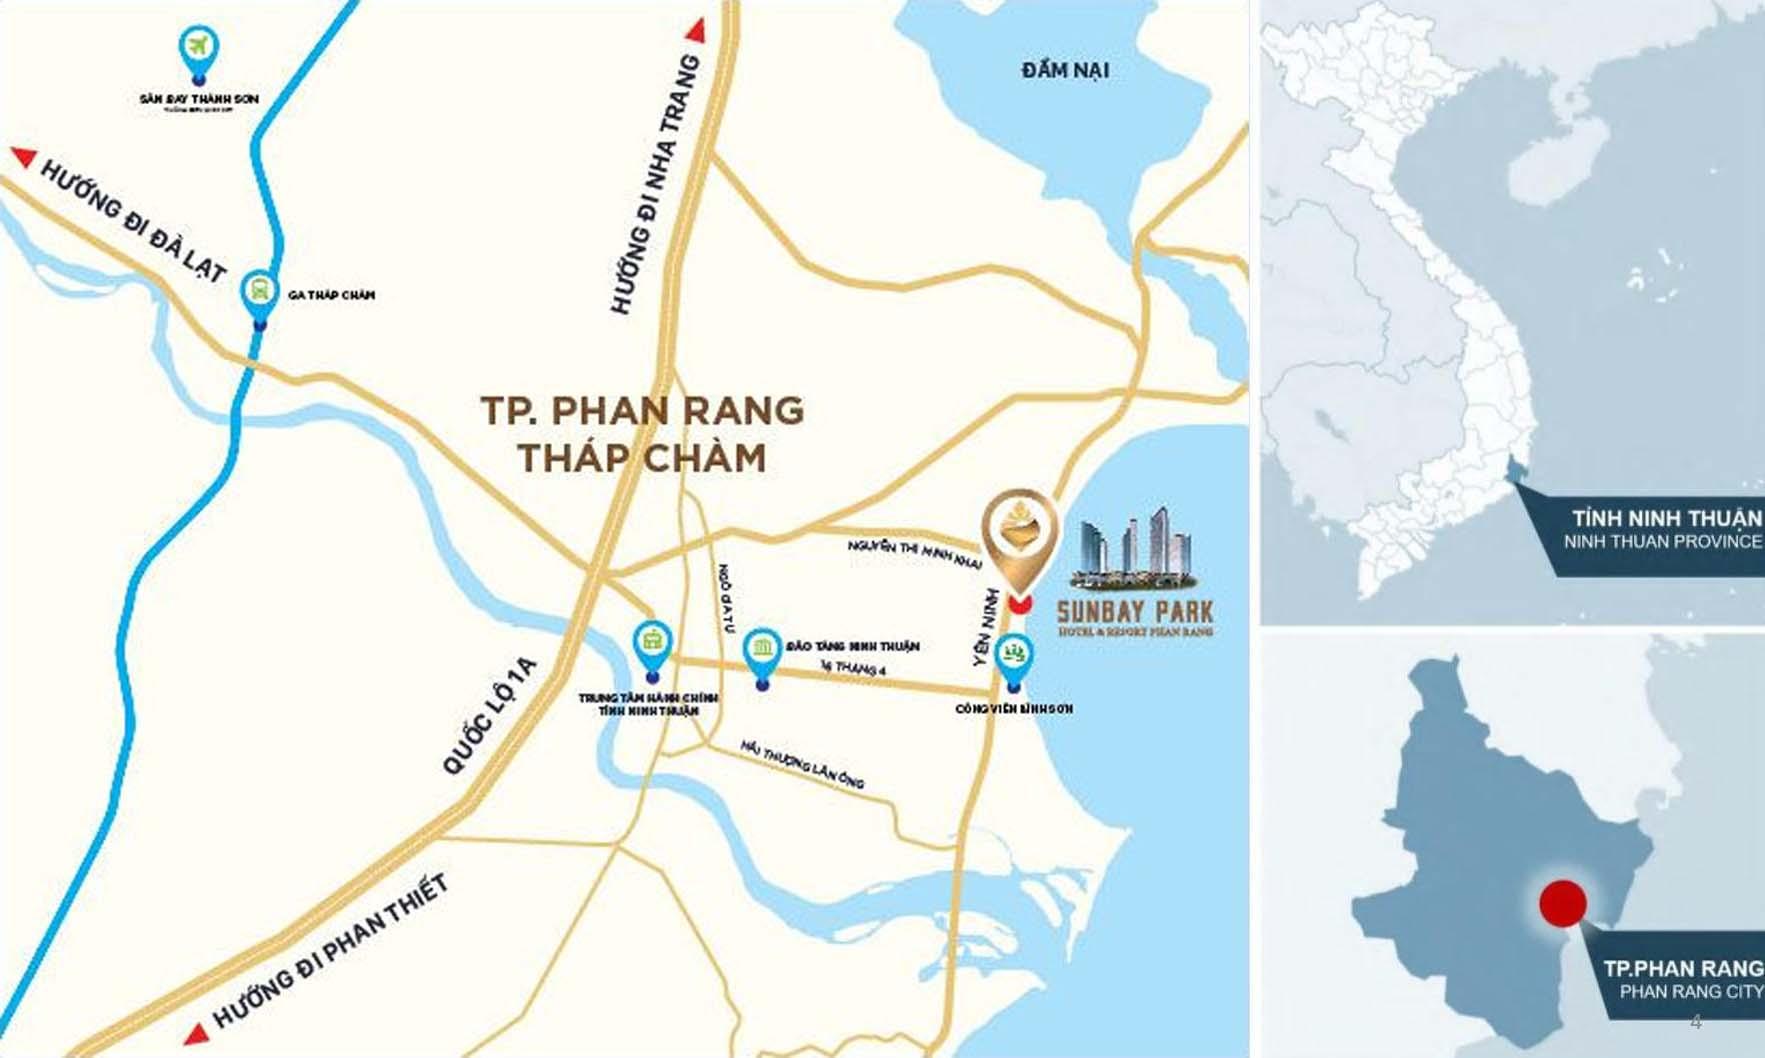 du-an-sunbay-park-phan-rang-ninh-thuan-3